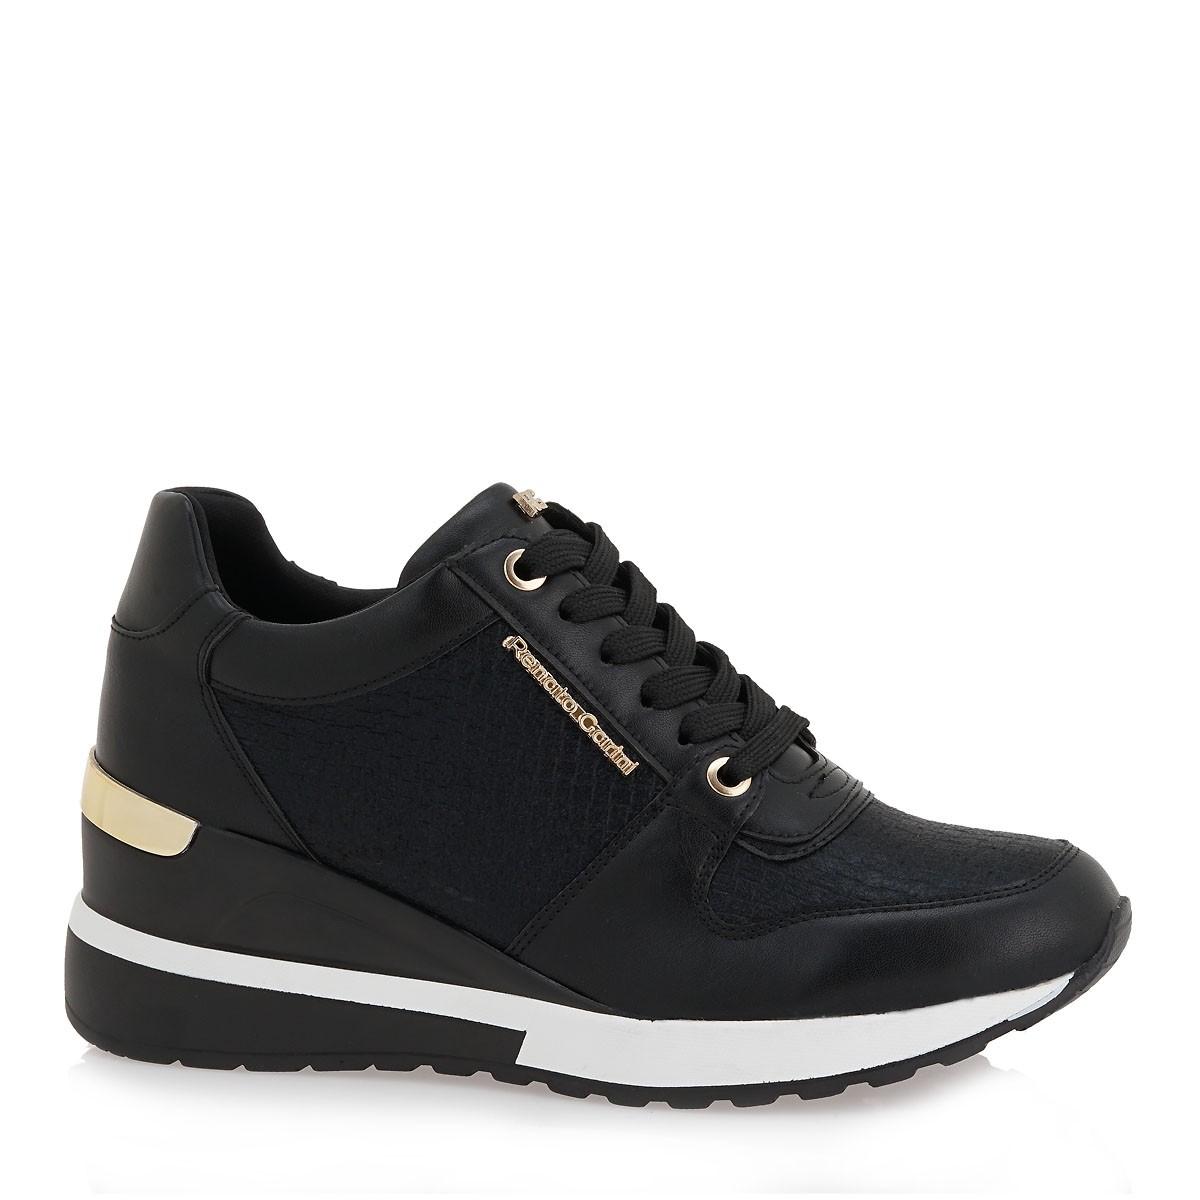 Renato Garini Γυναικεία Παπούτσια Sneakers 251-RG2251 Μαύρο Πλεκτό L119R251350L